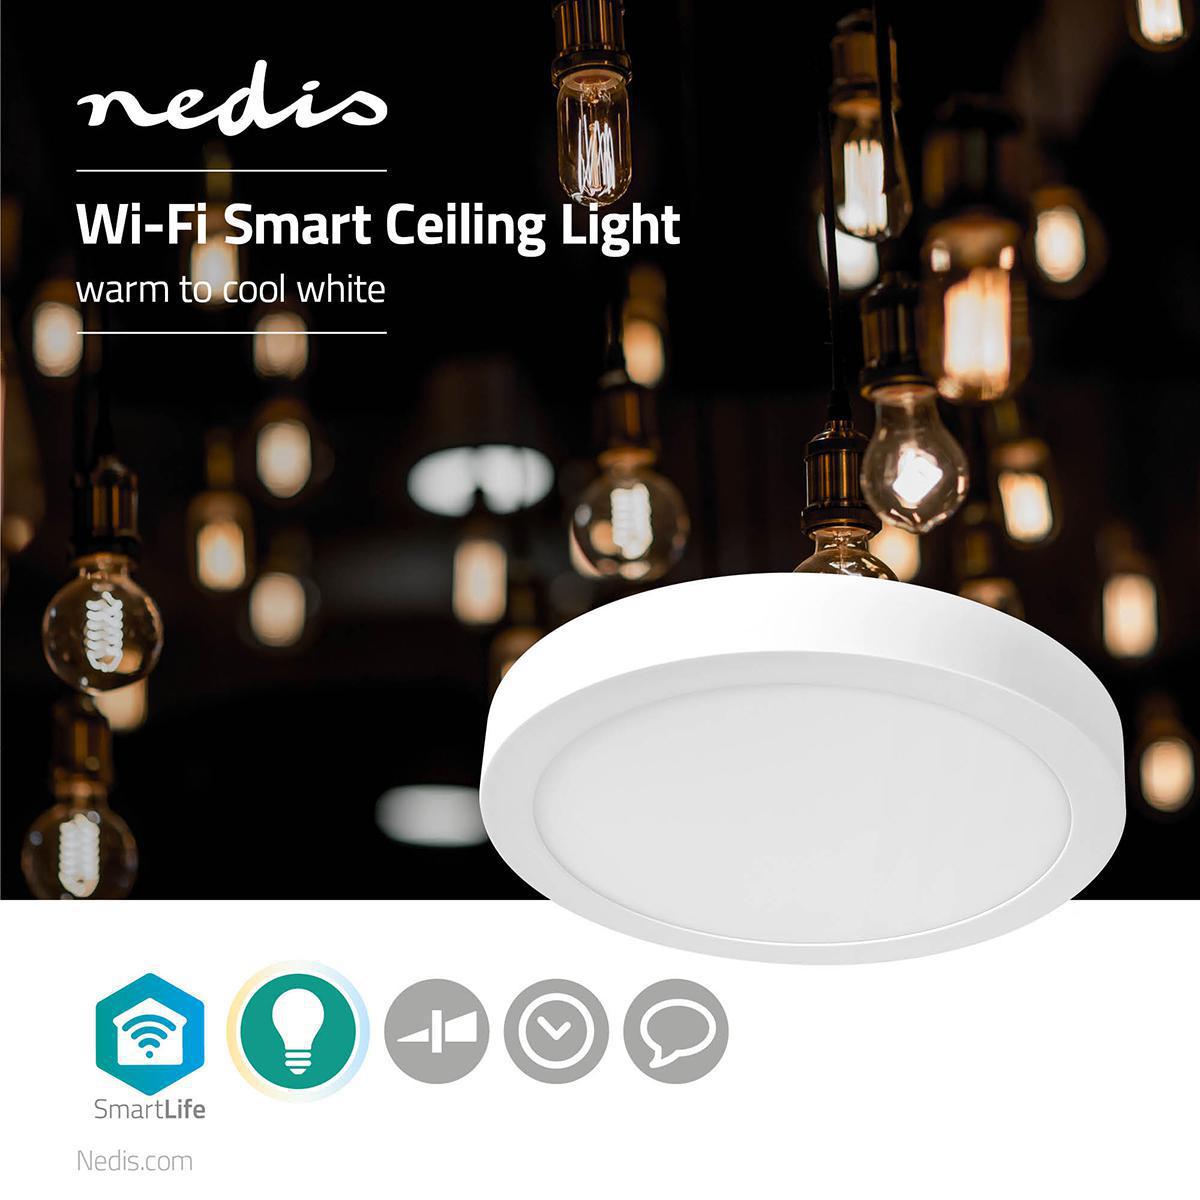 WiFi - Smart LED plafondlamp - 18 watt - 30cm - warm tot koel wit - 18 watt - dimbaar - app besturing - sfeerfoto